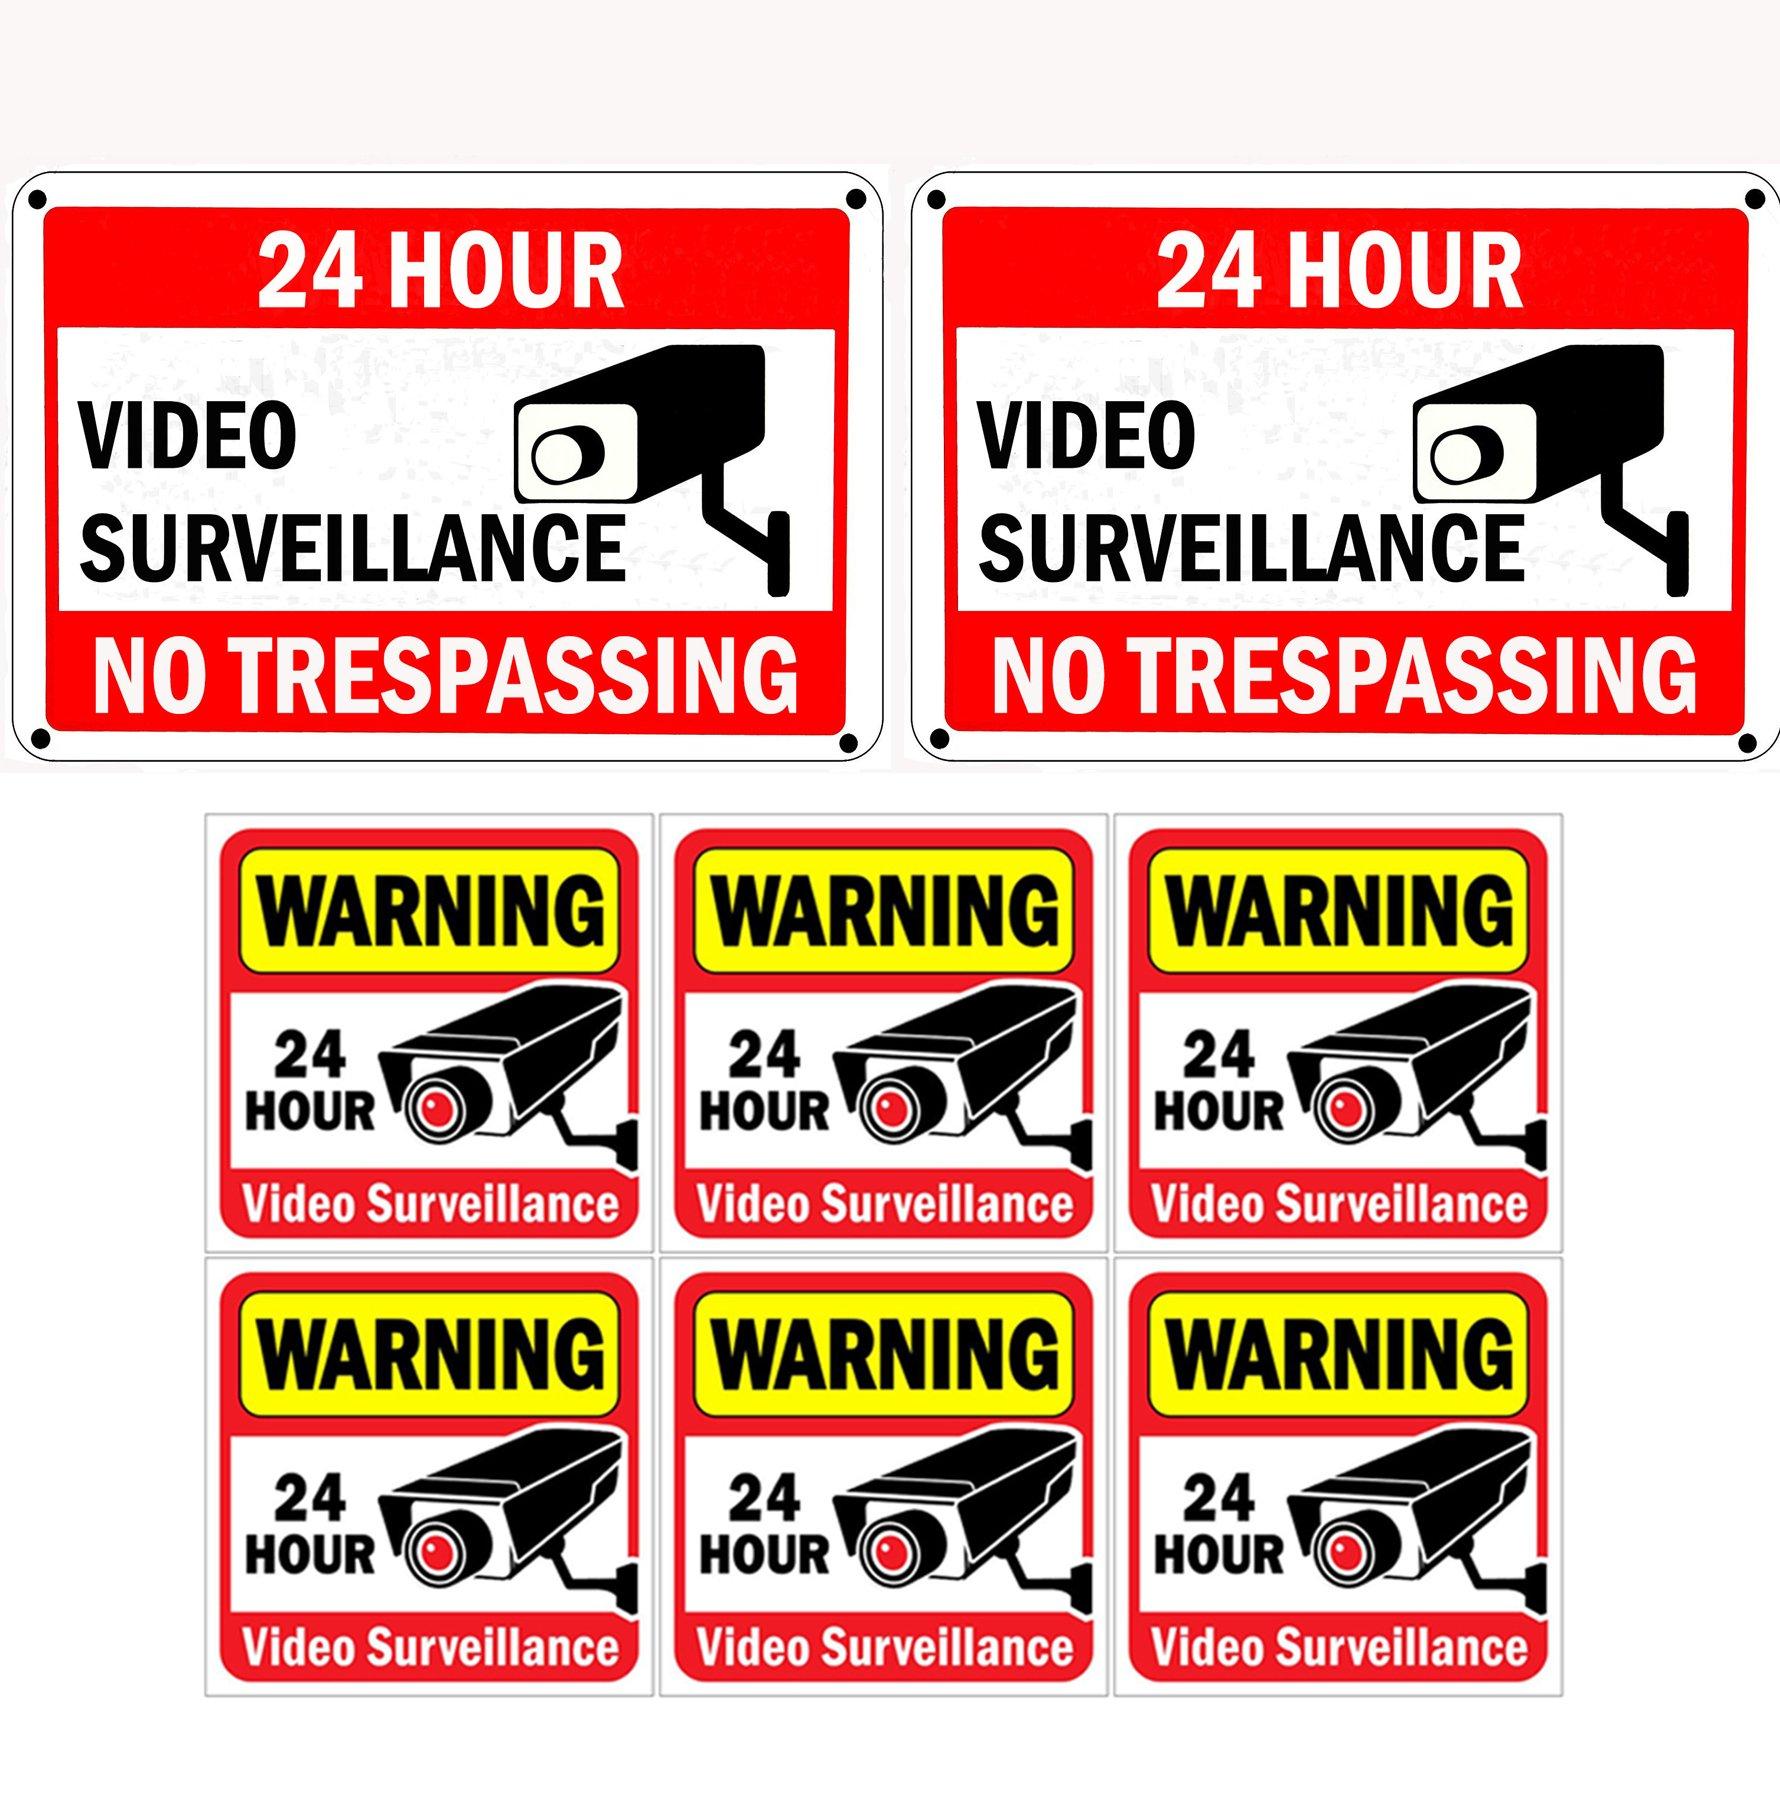 2 x Warning 24 Hour Video Surveillance stickers